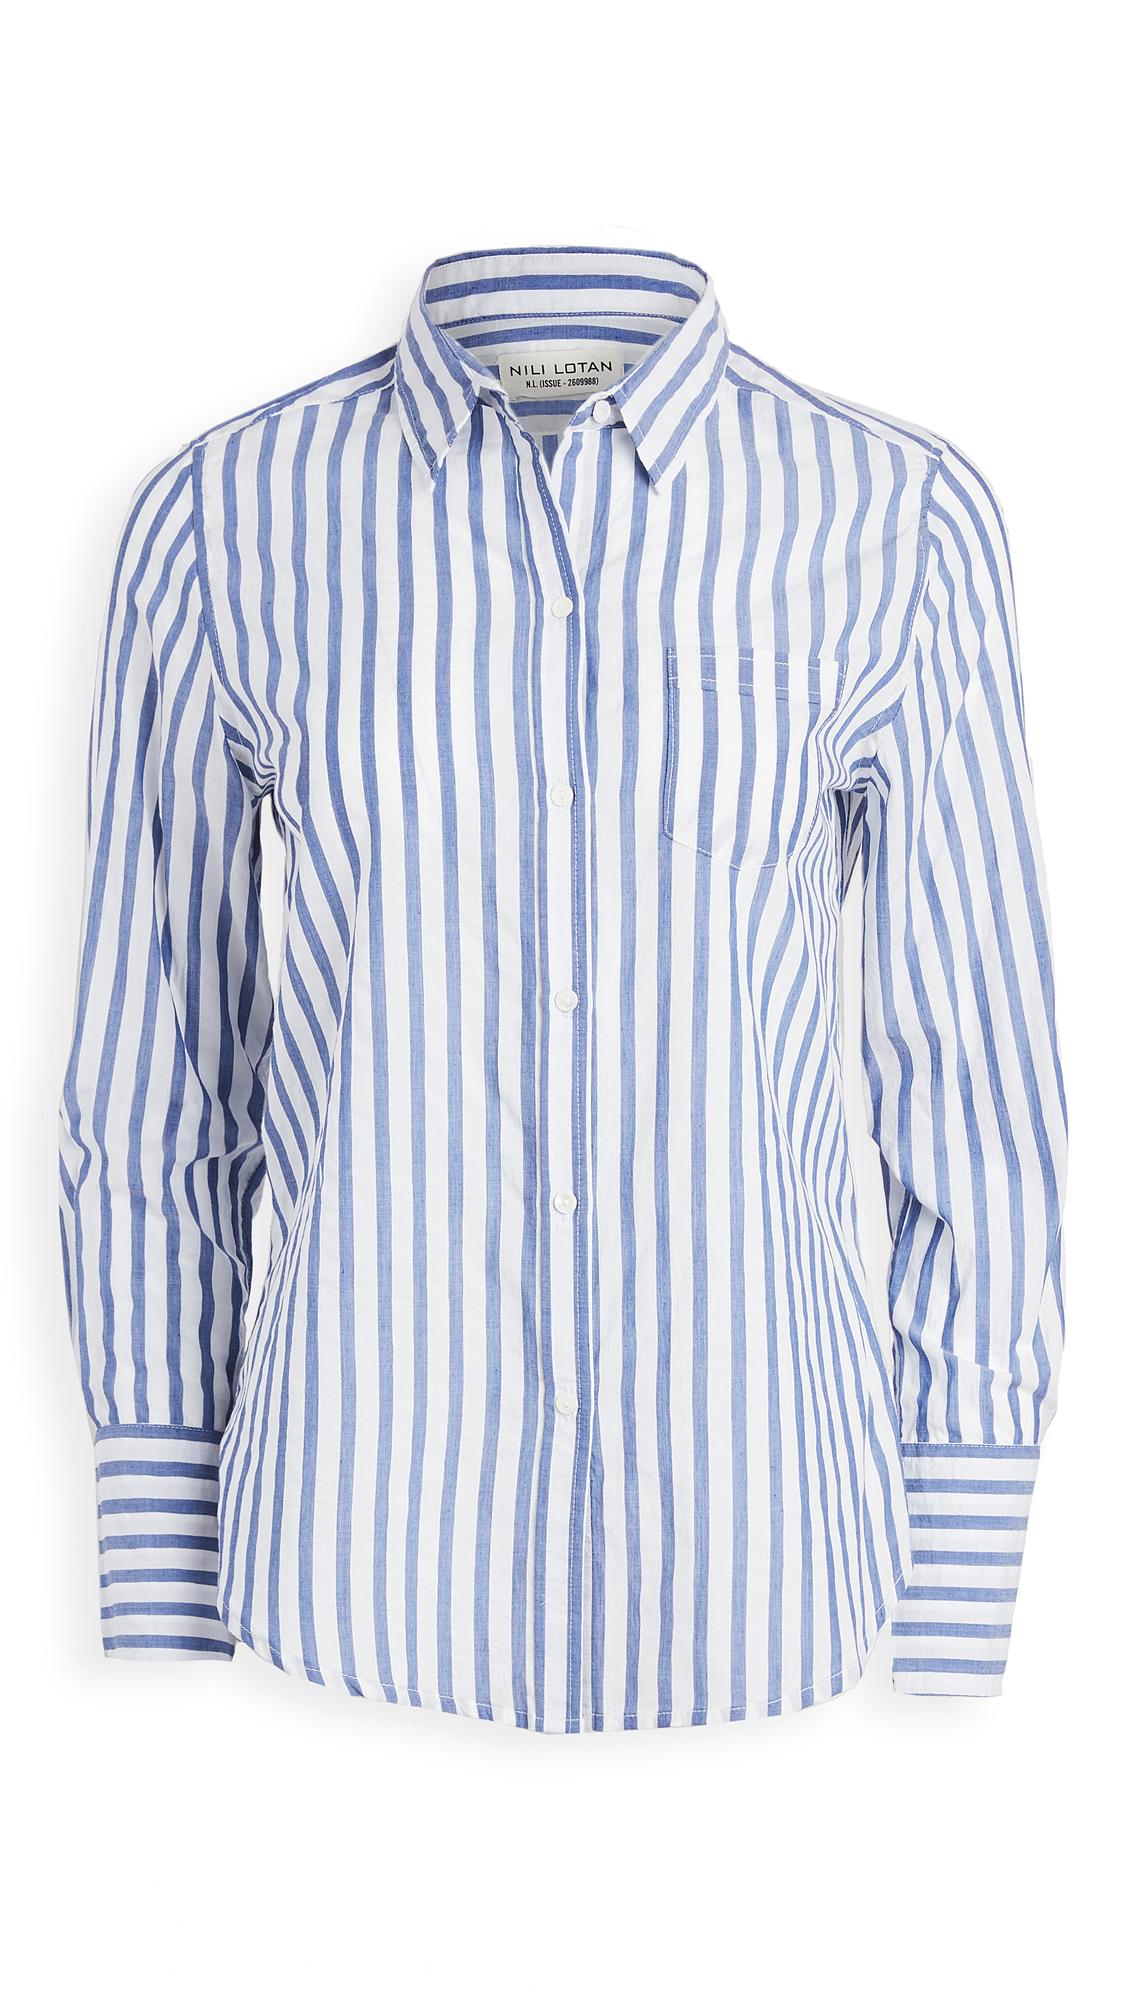 Nili Lotan NL Shirt - 30% Off Sale